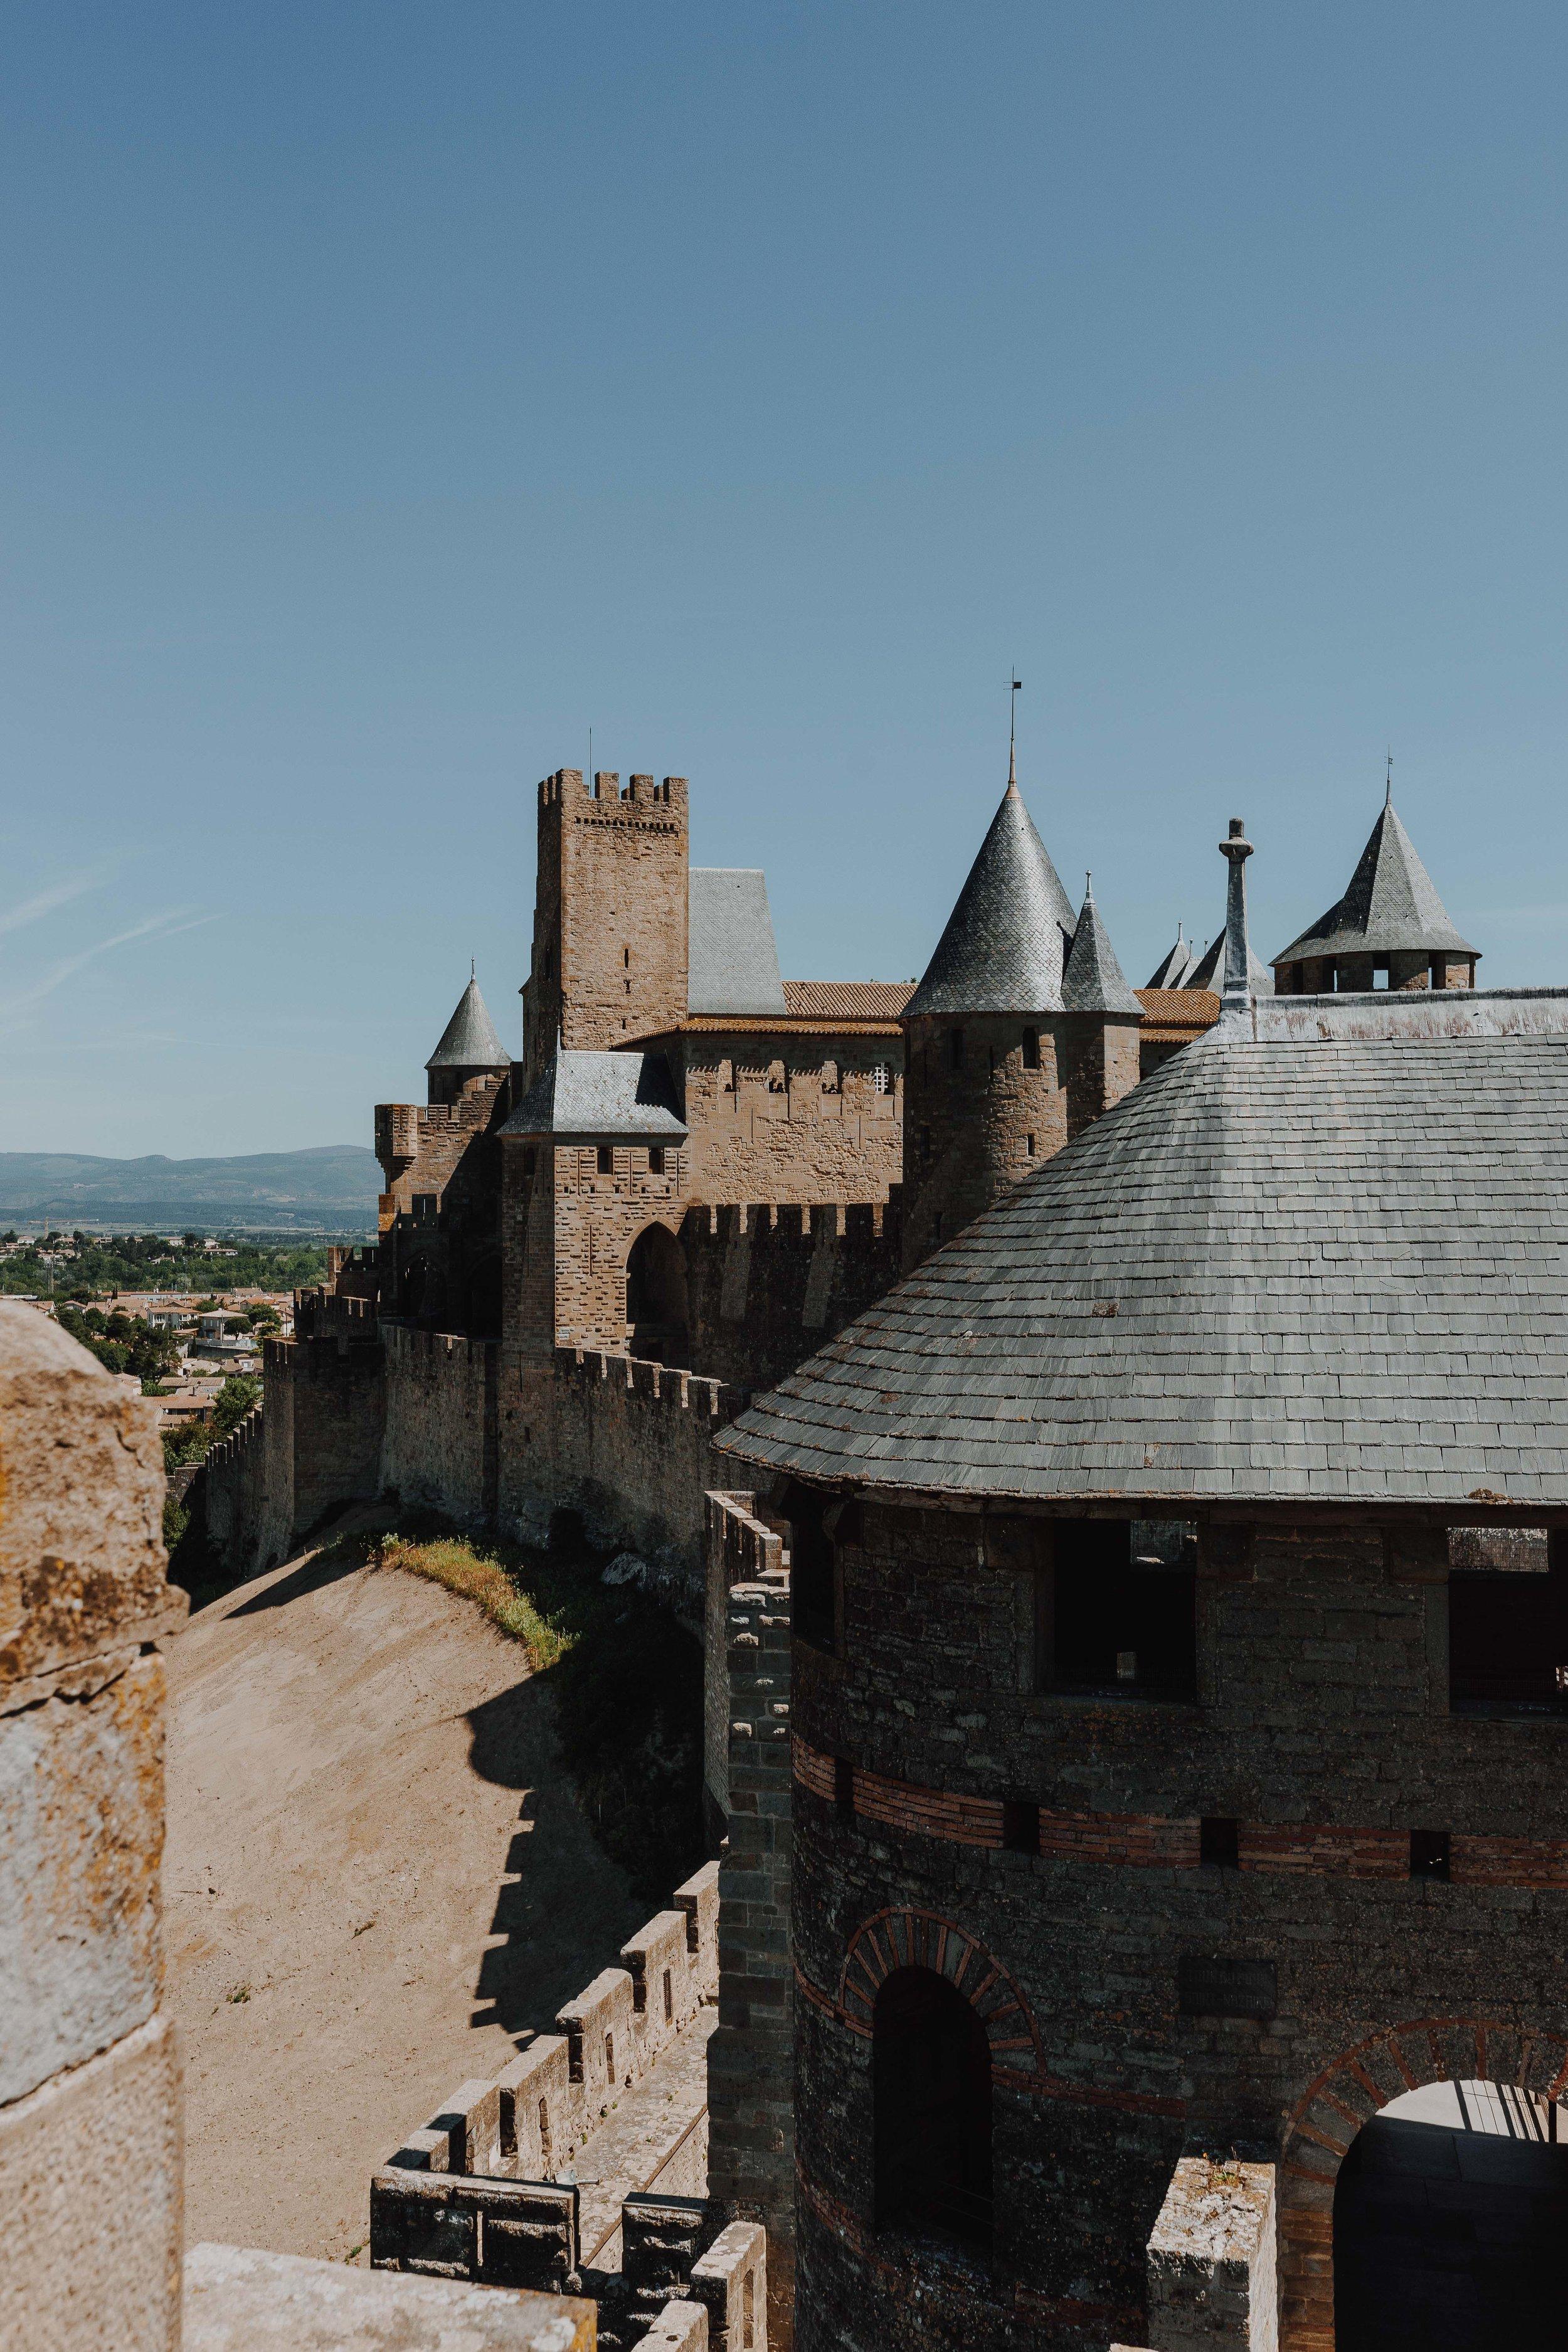 ASROSENVINGE_AtoutFrance_Occitanie_Toulouse_LowRes-234.jpg